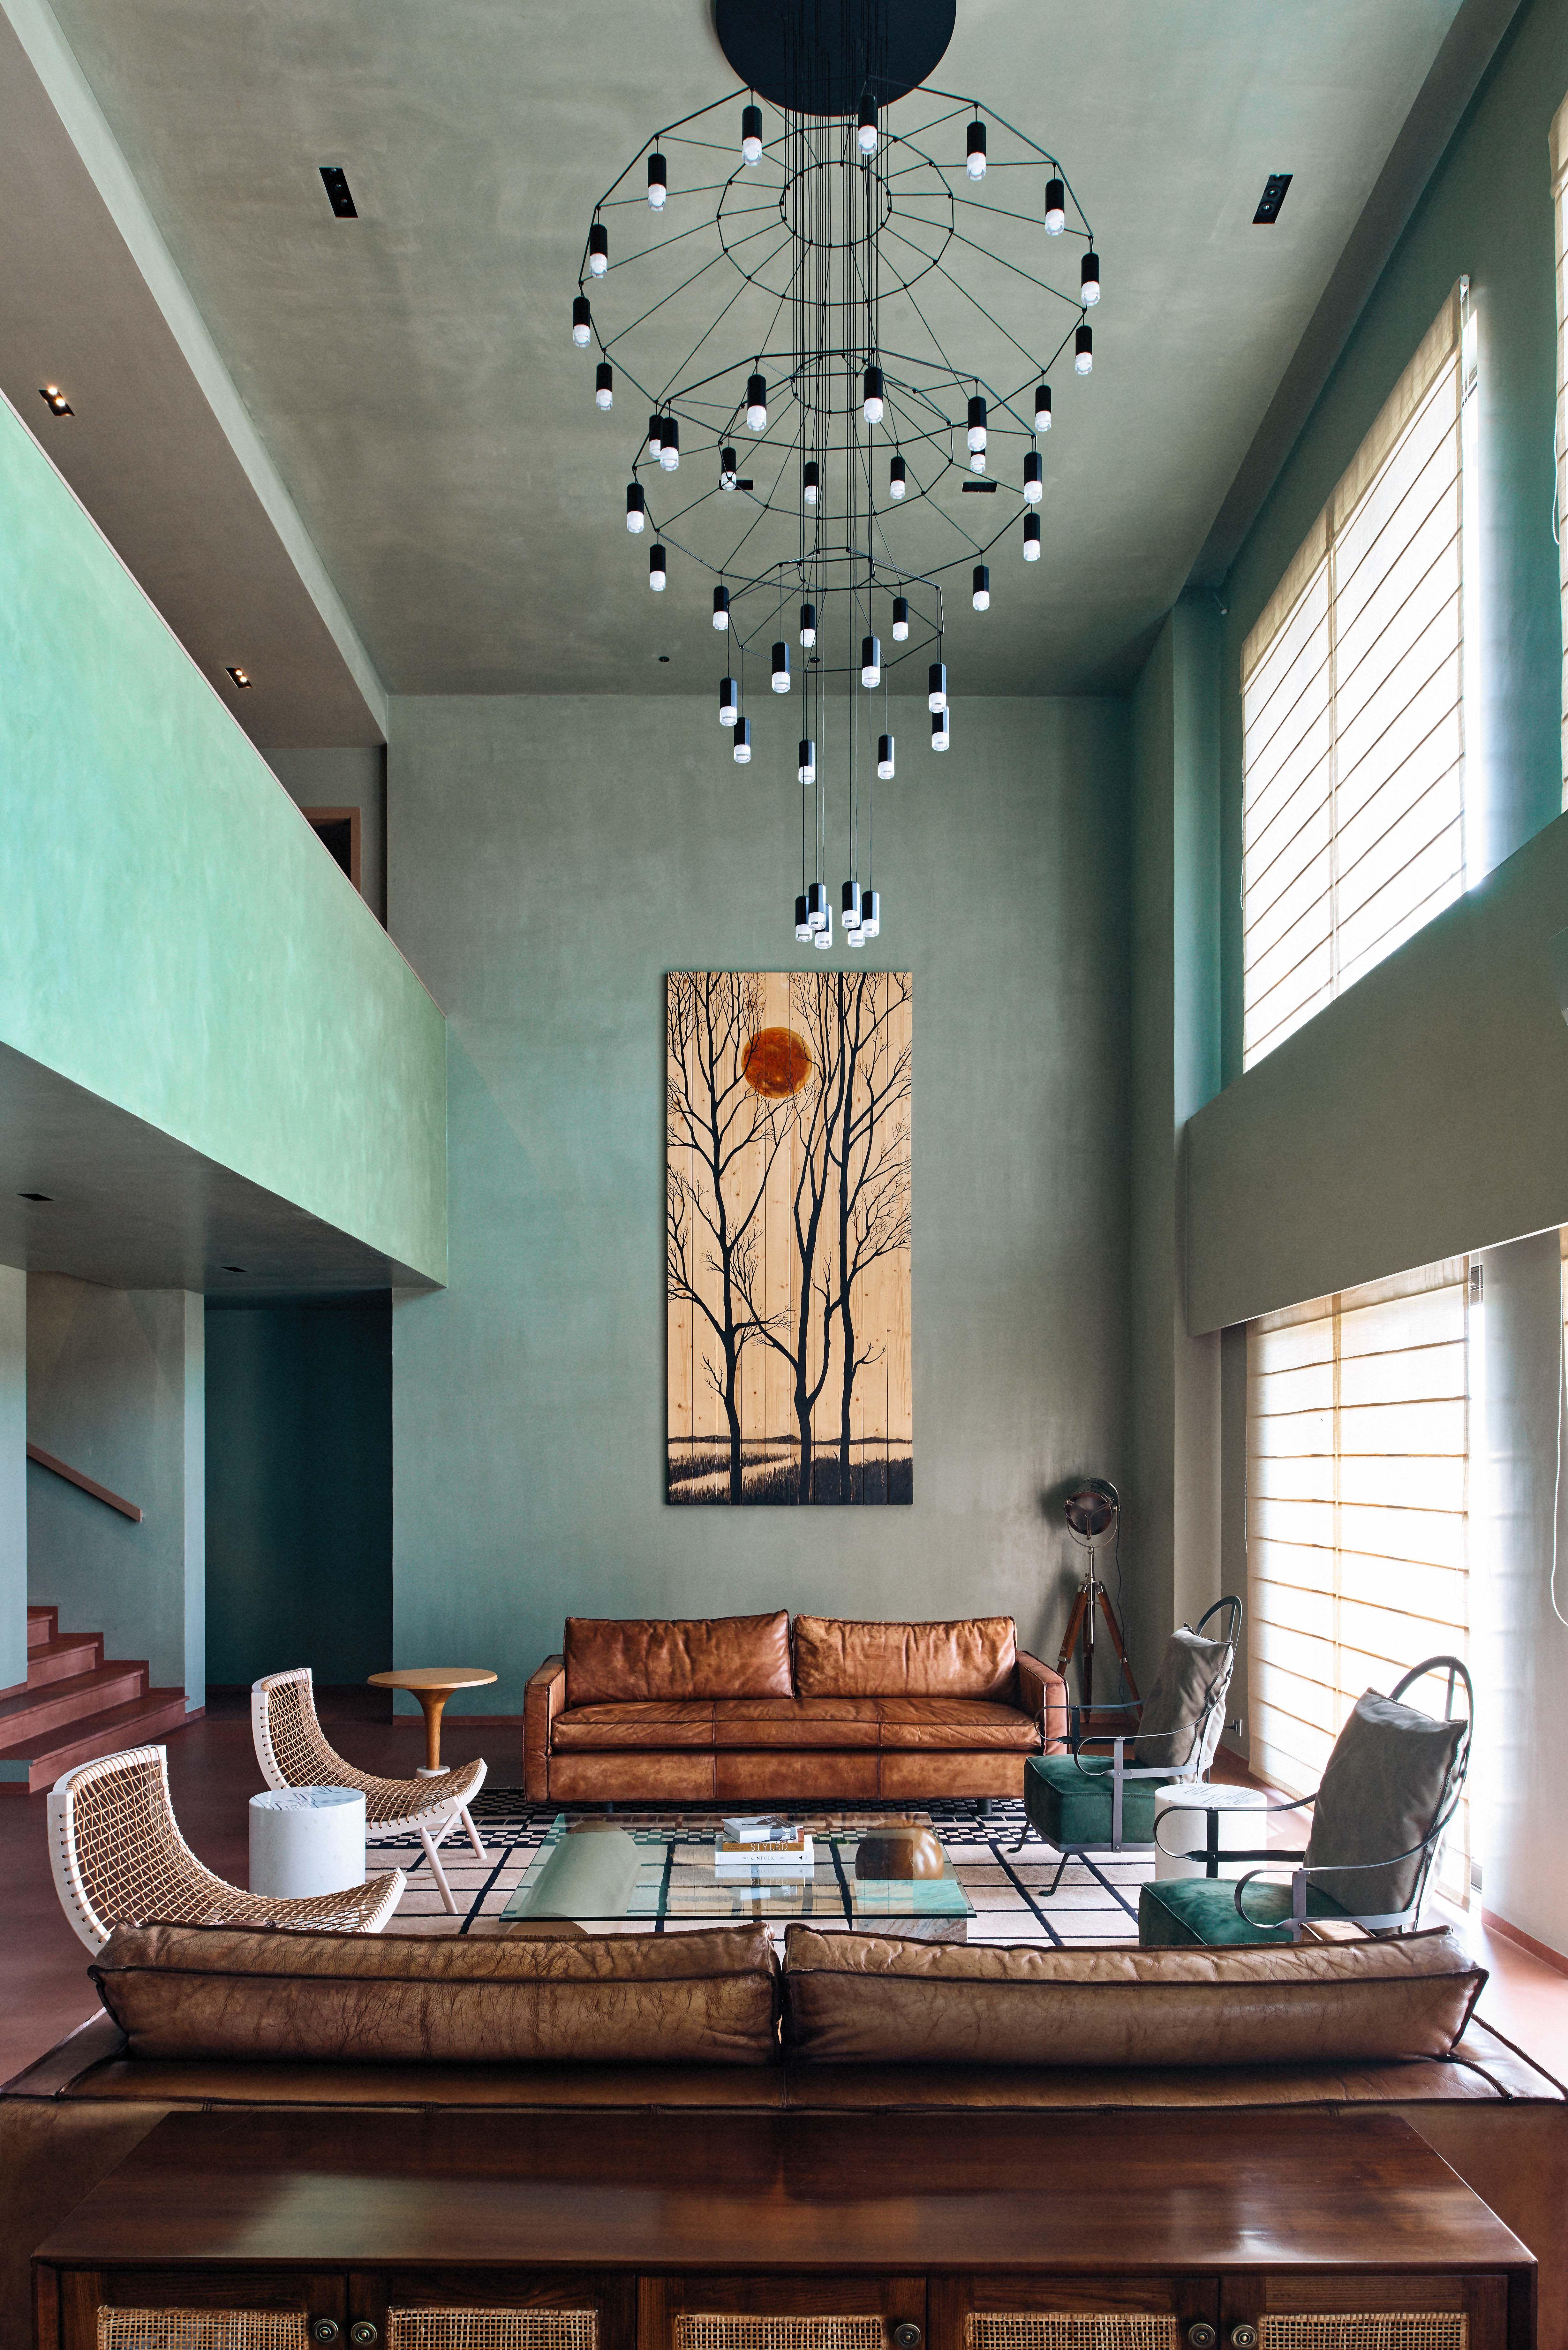 Home interior design gurgaon interior design  inside a modern minimalist gurgaon home inspired